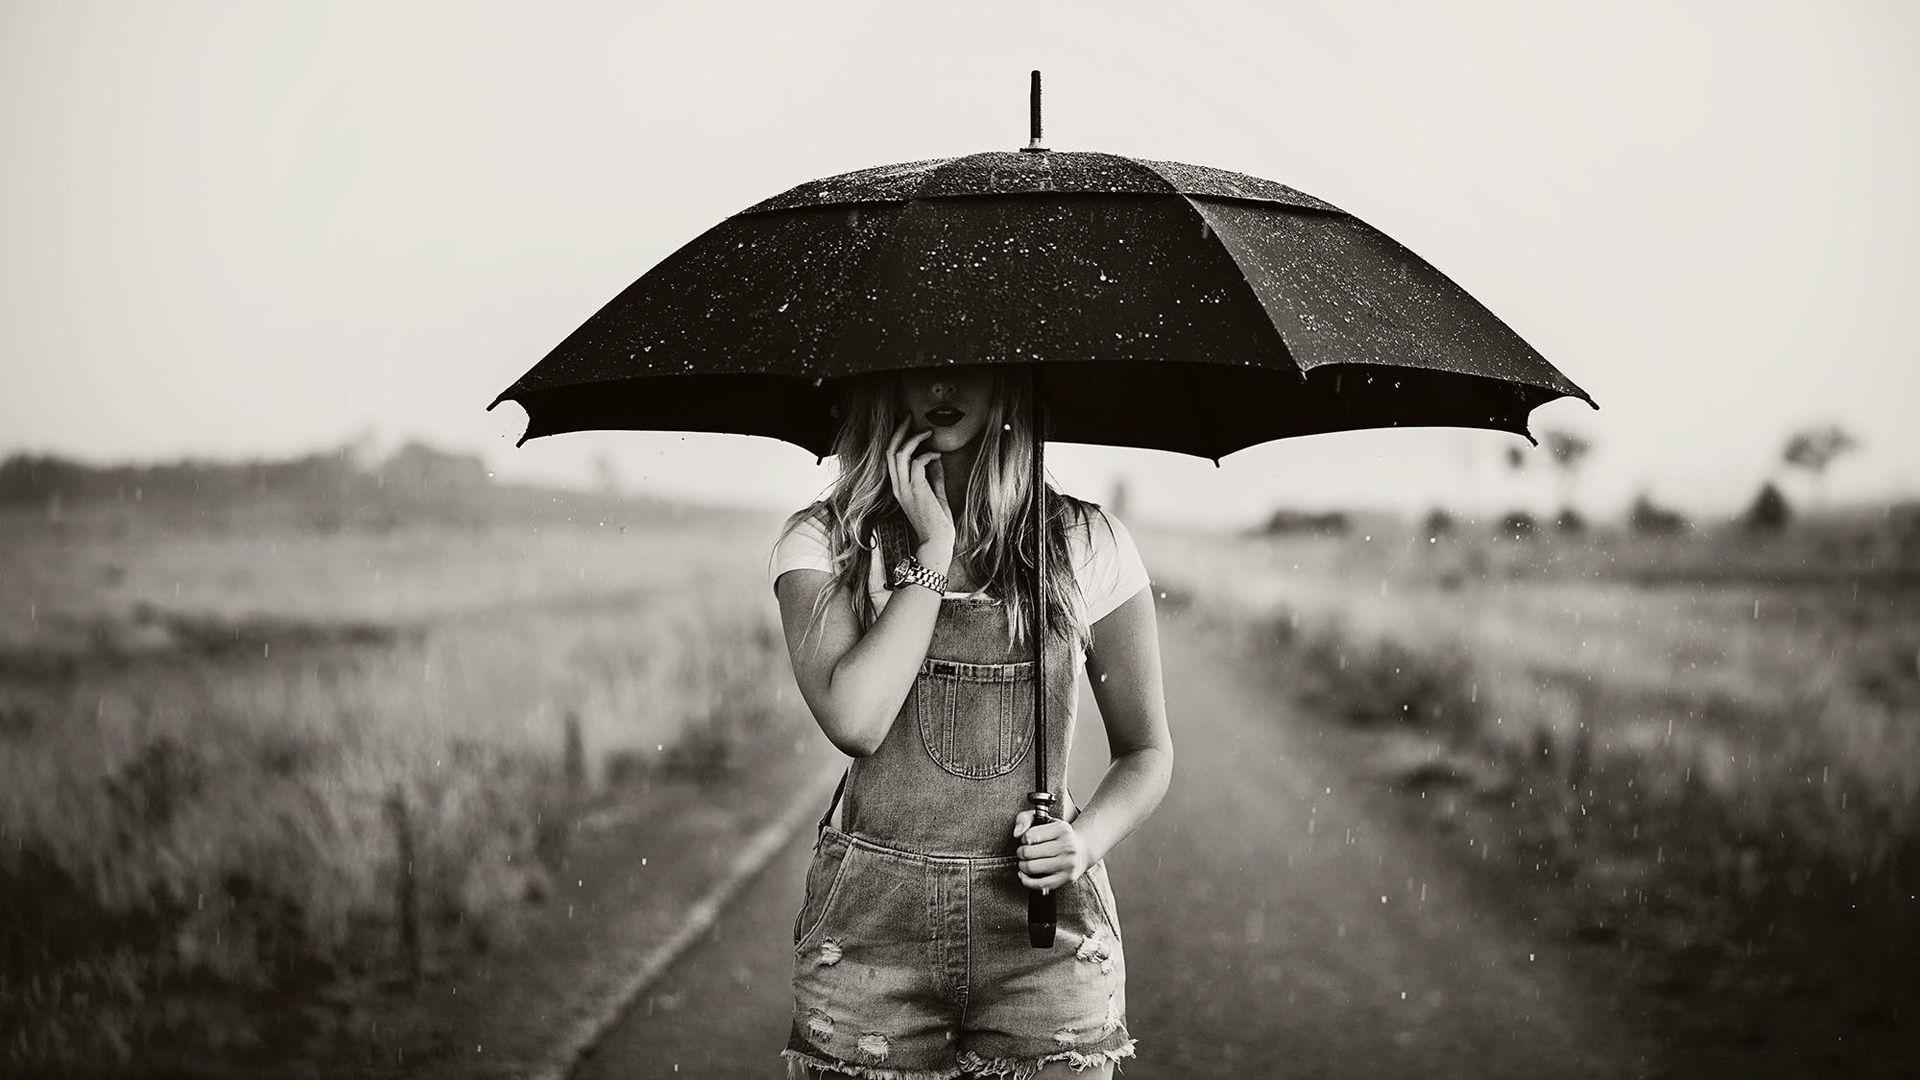 Alone Boy In Rain Wallpaper Hd The Best Hd Wallpaper Sad Girl With Umbrella 763625 Hd Wallpaper Backgrounds Download